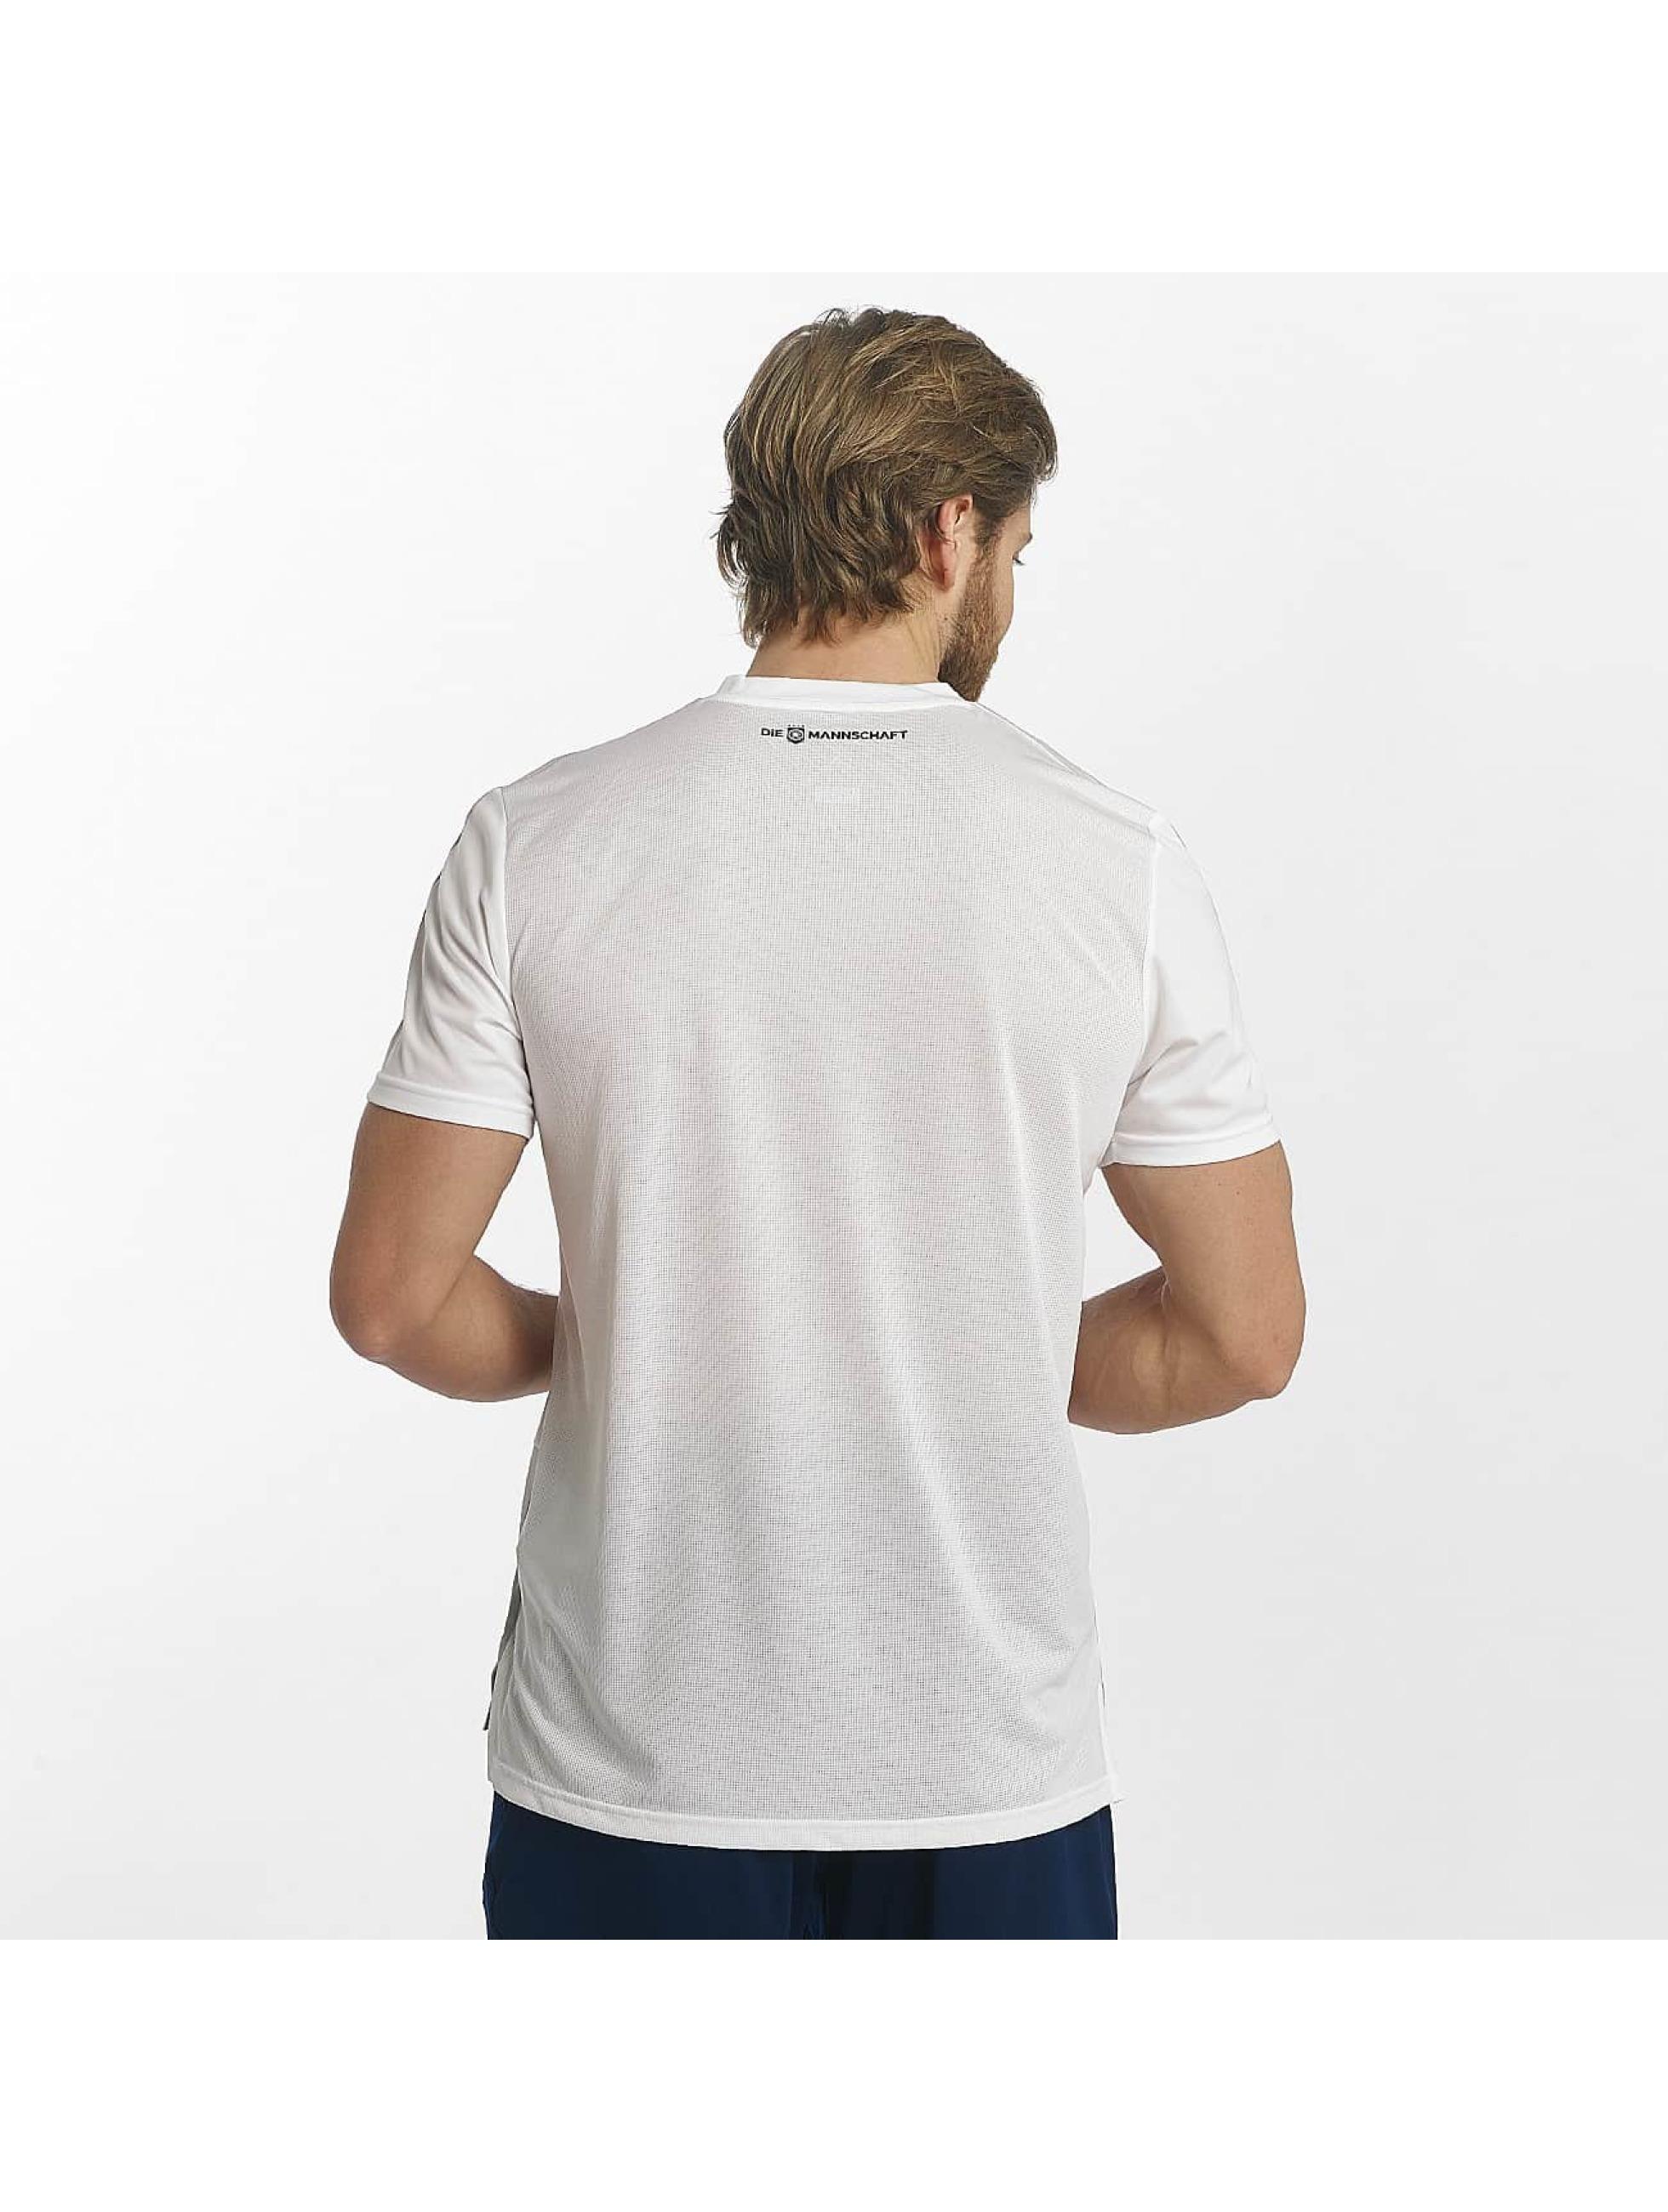 adidas Performance camiseta de fútbol DFB Training blanco